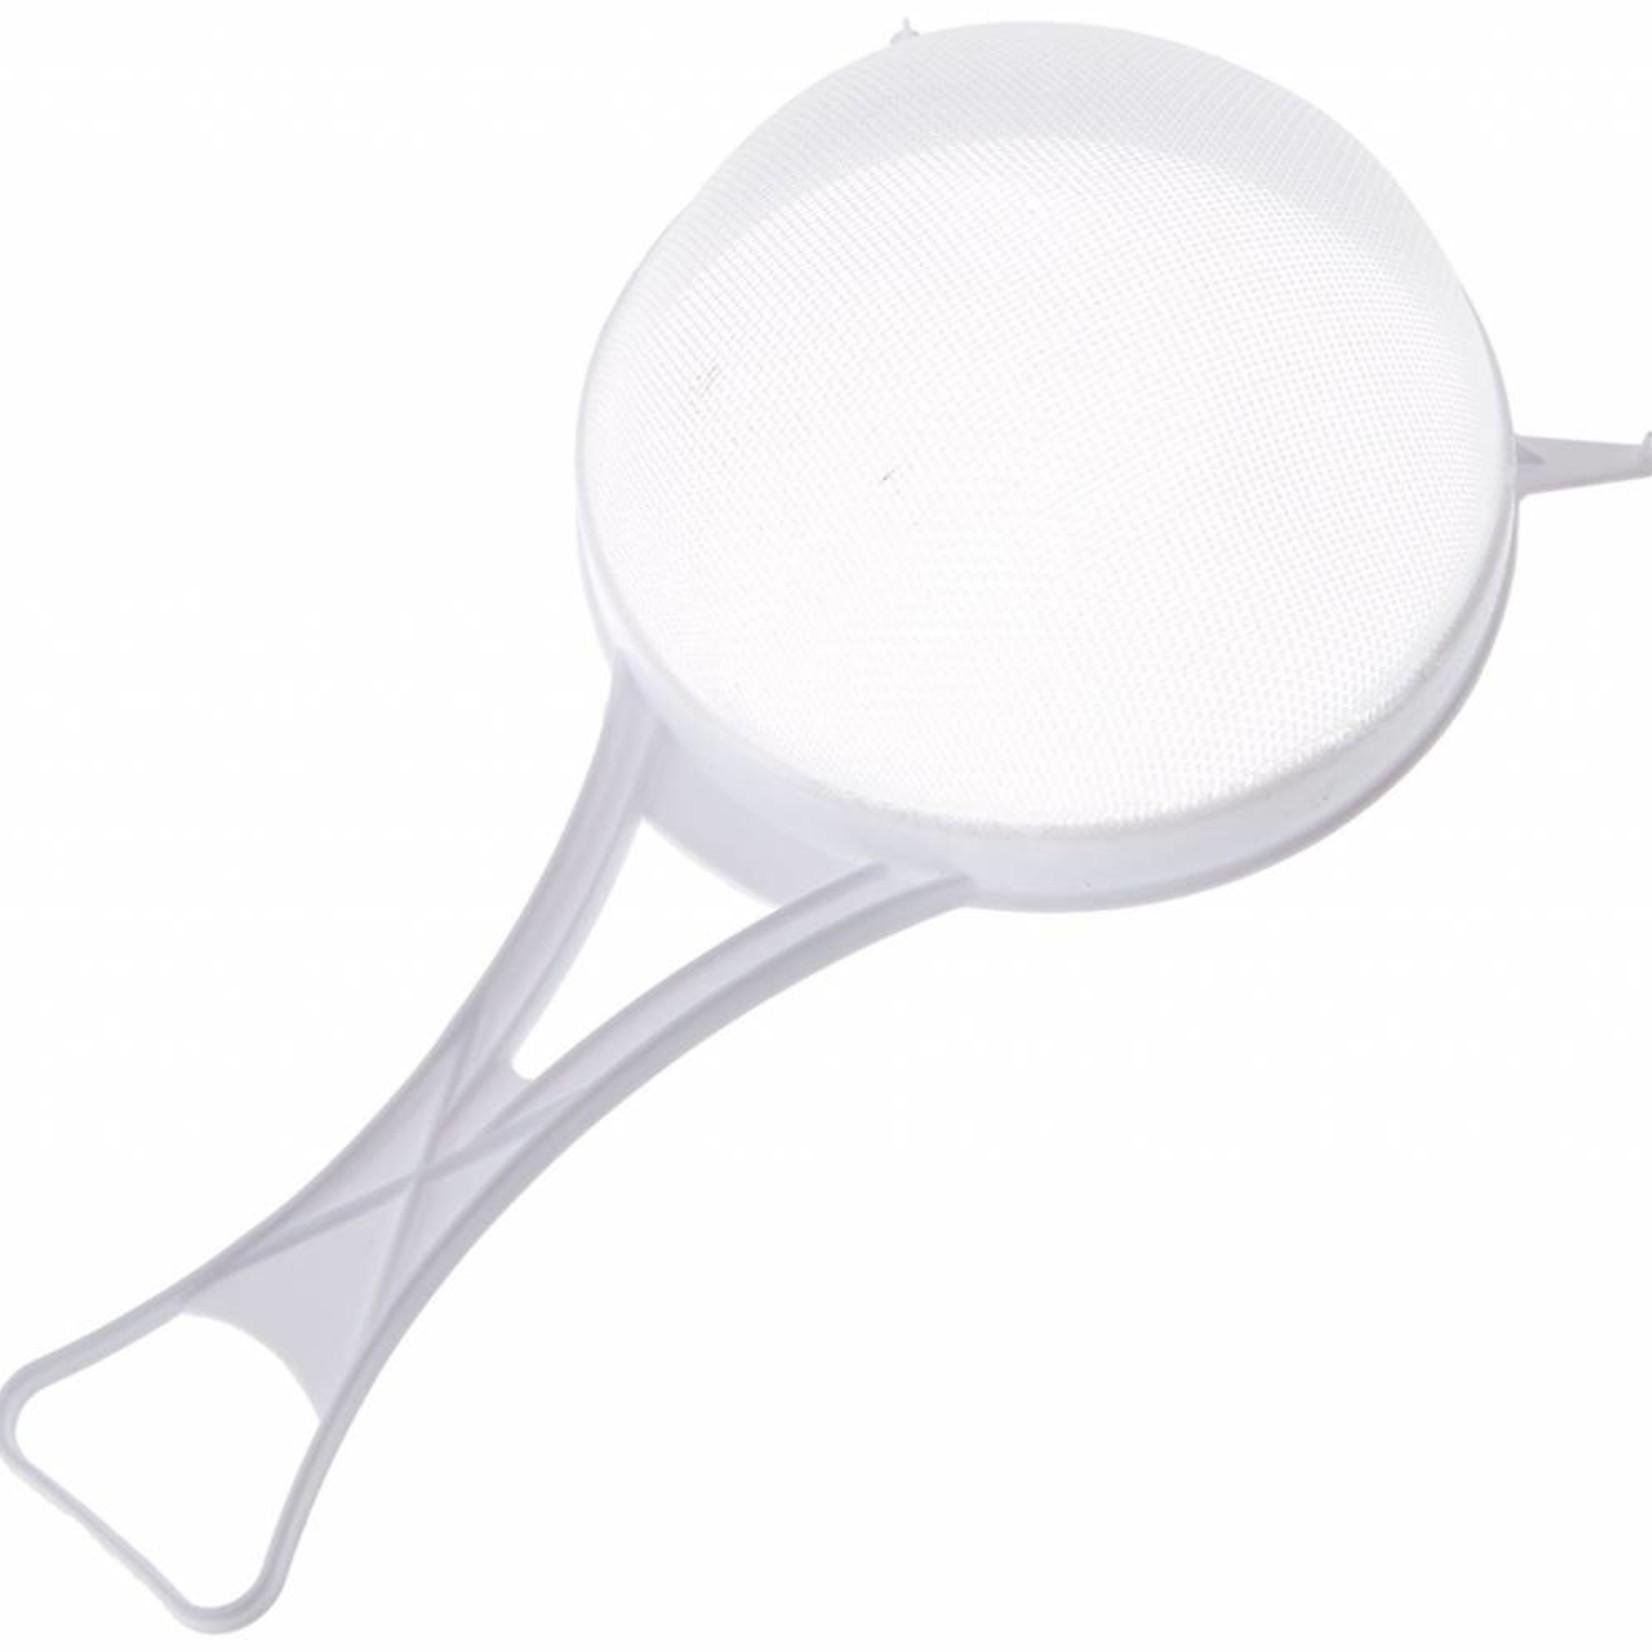 CHEF AID 15CM WHITE PLASTIC STRAINER SIEVE